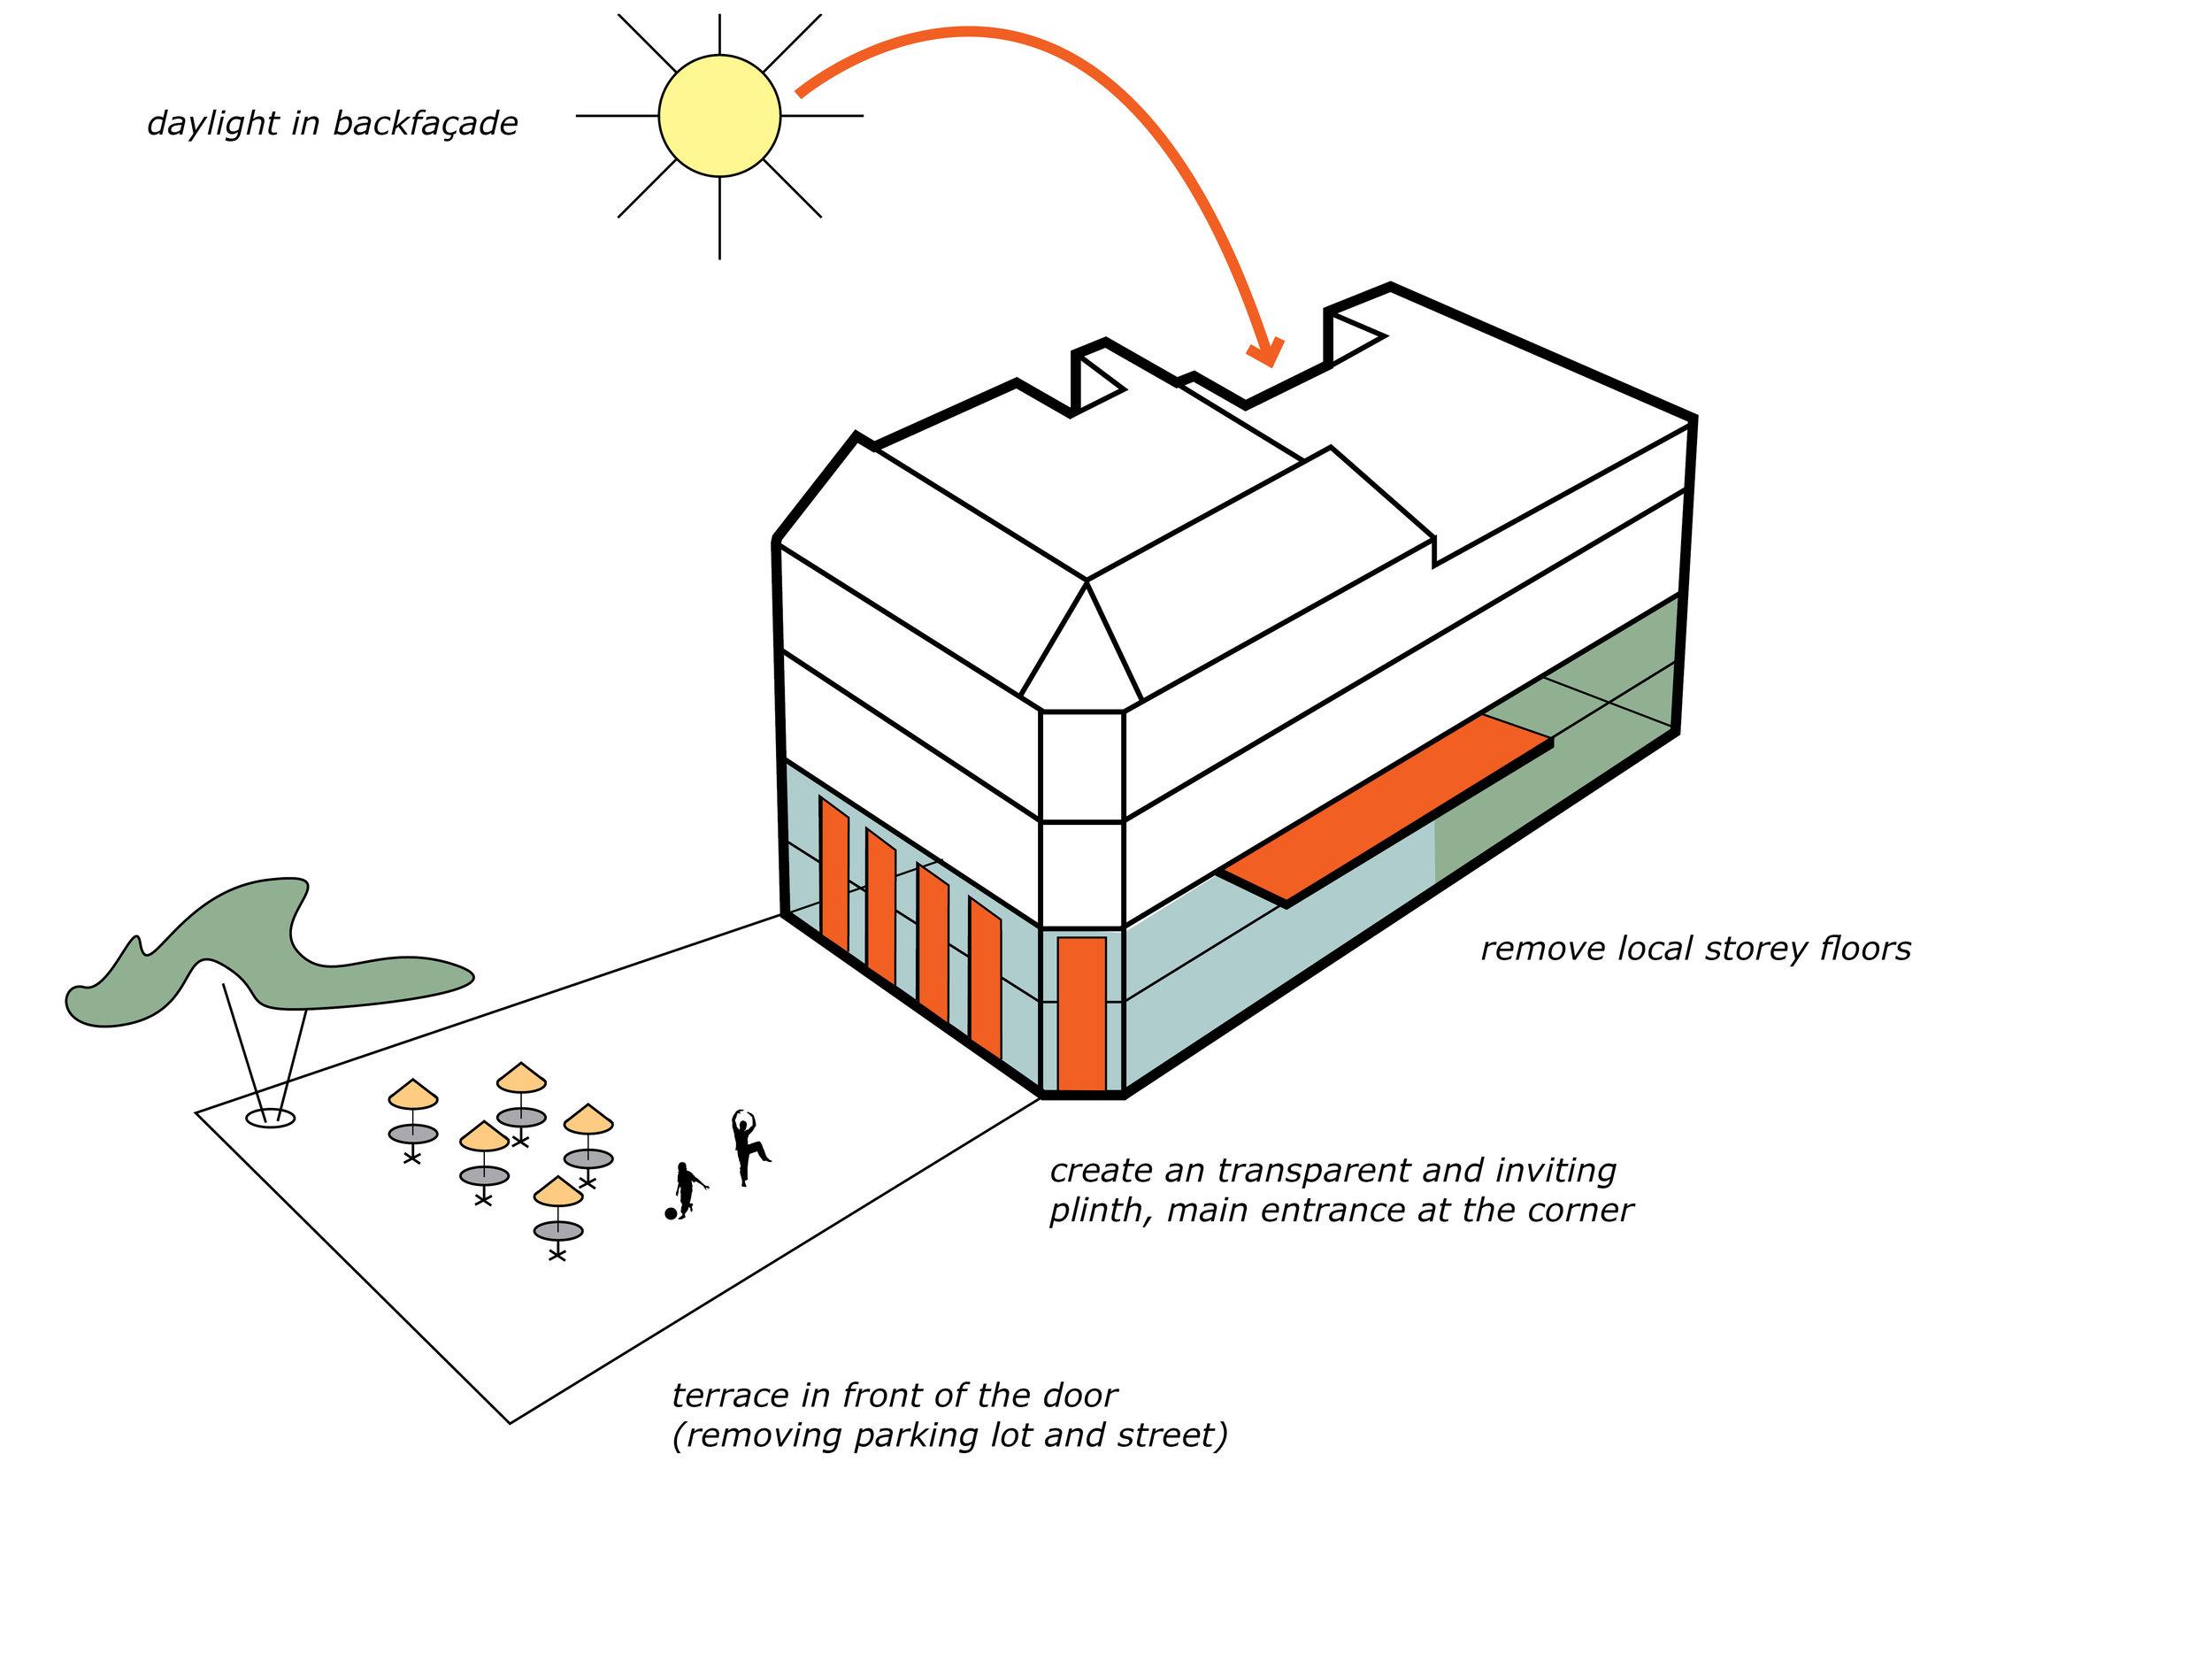 Personal-Architecture-rotterdam-wam-22.jpg